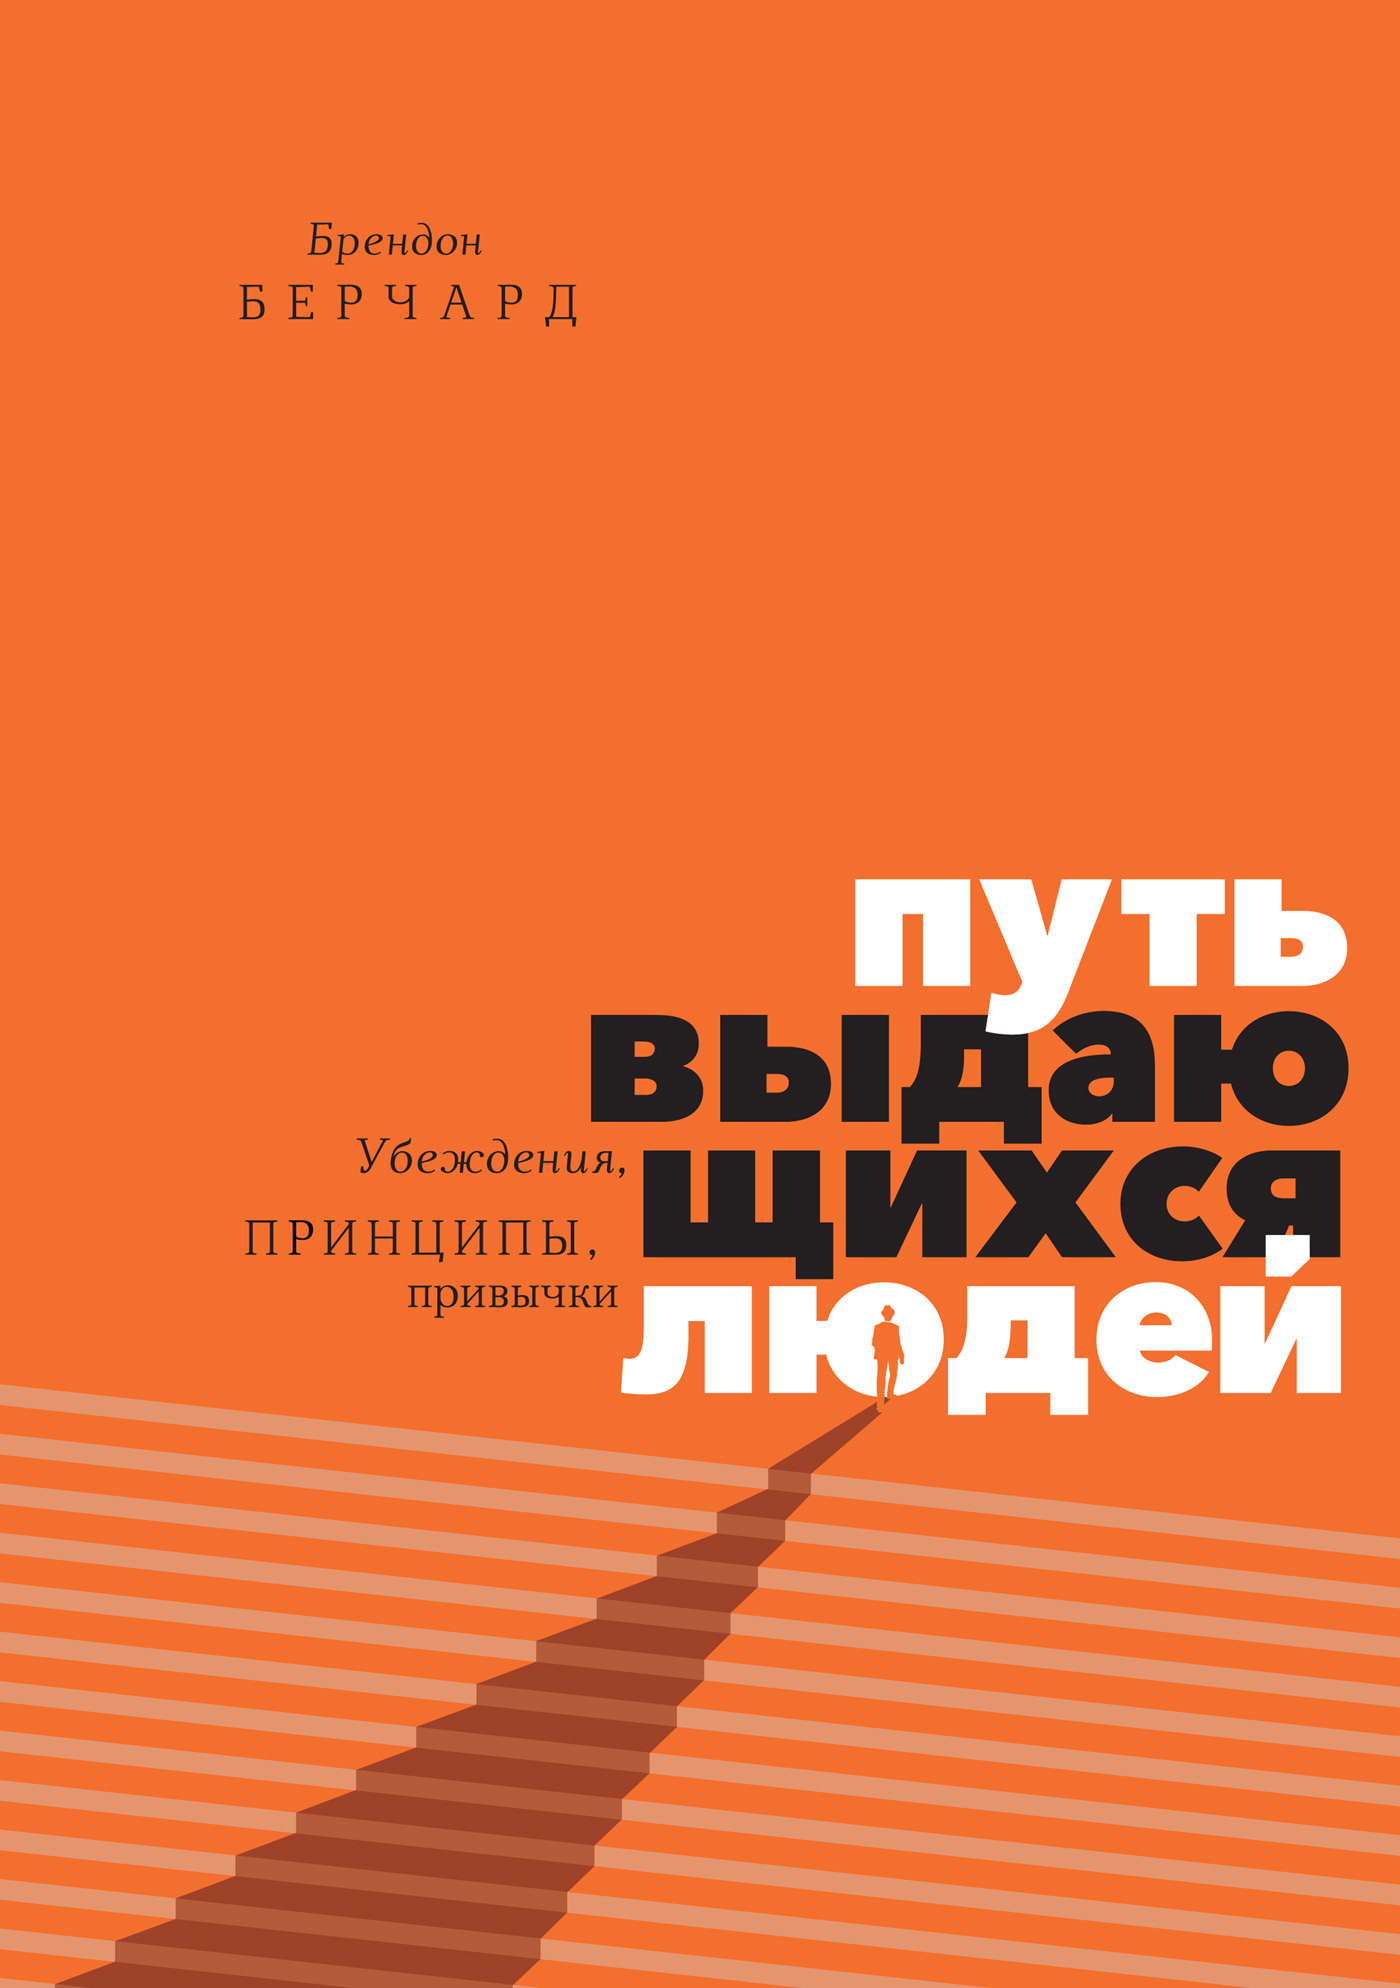 Обложка книги. Автор - Брендон Берчард